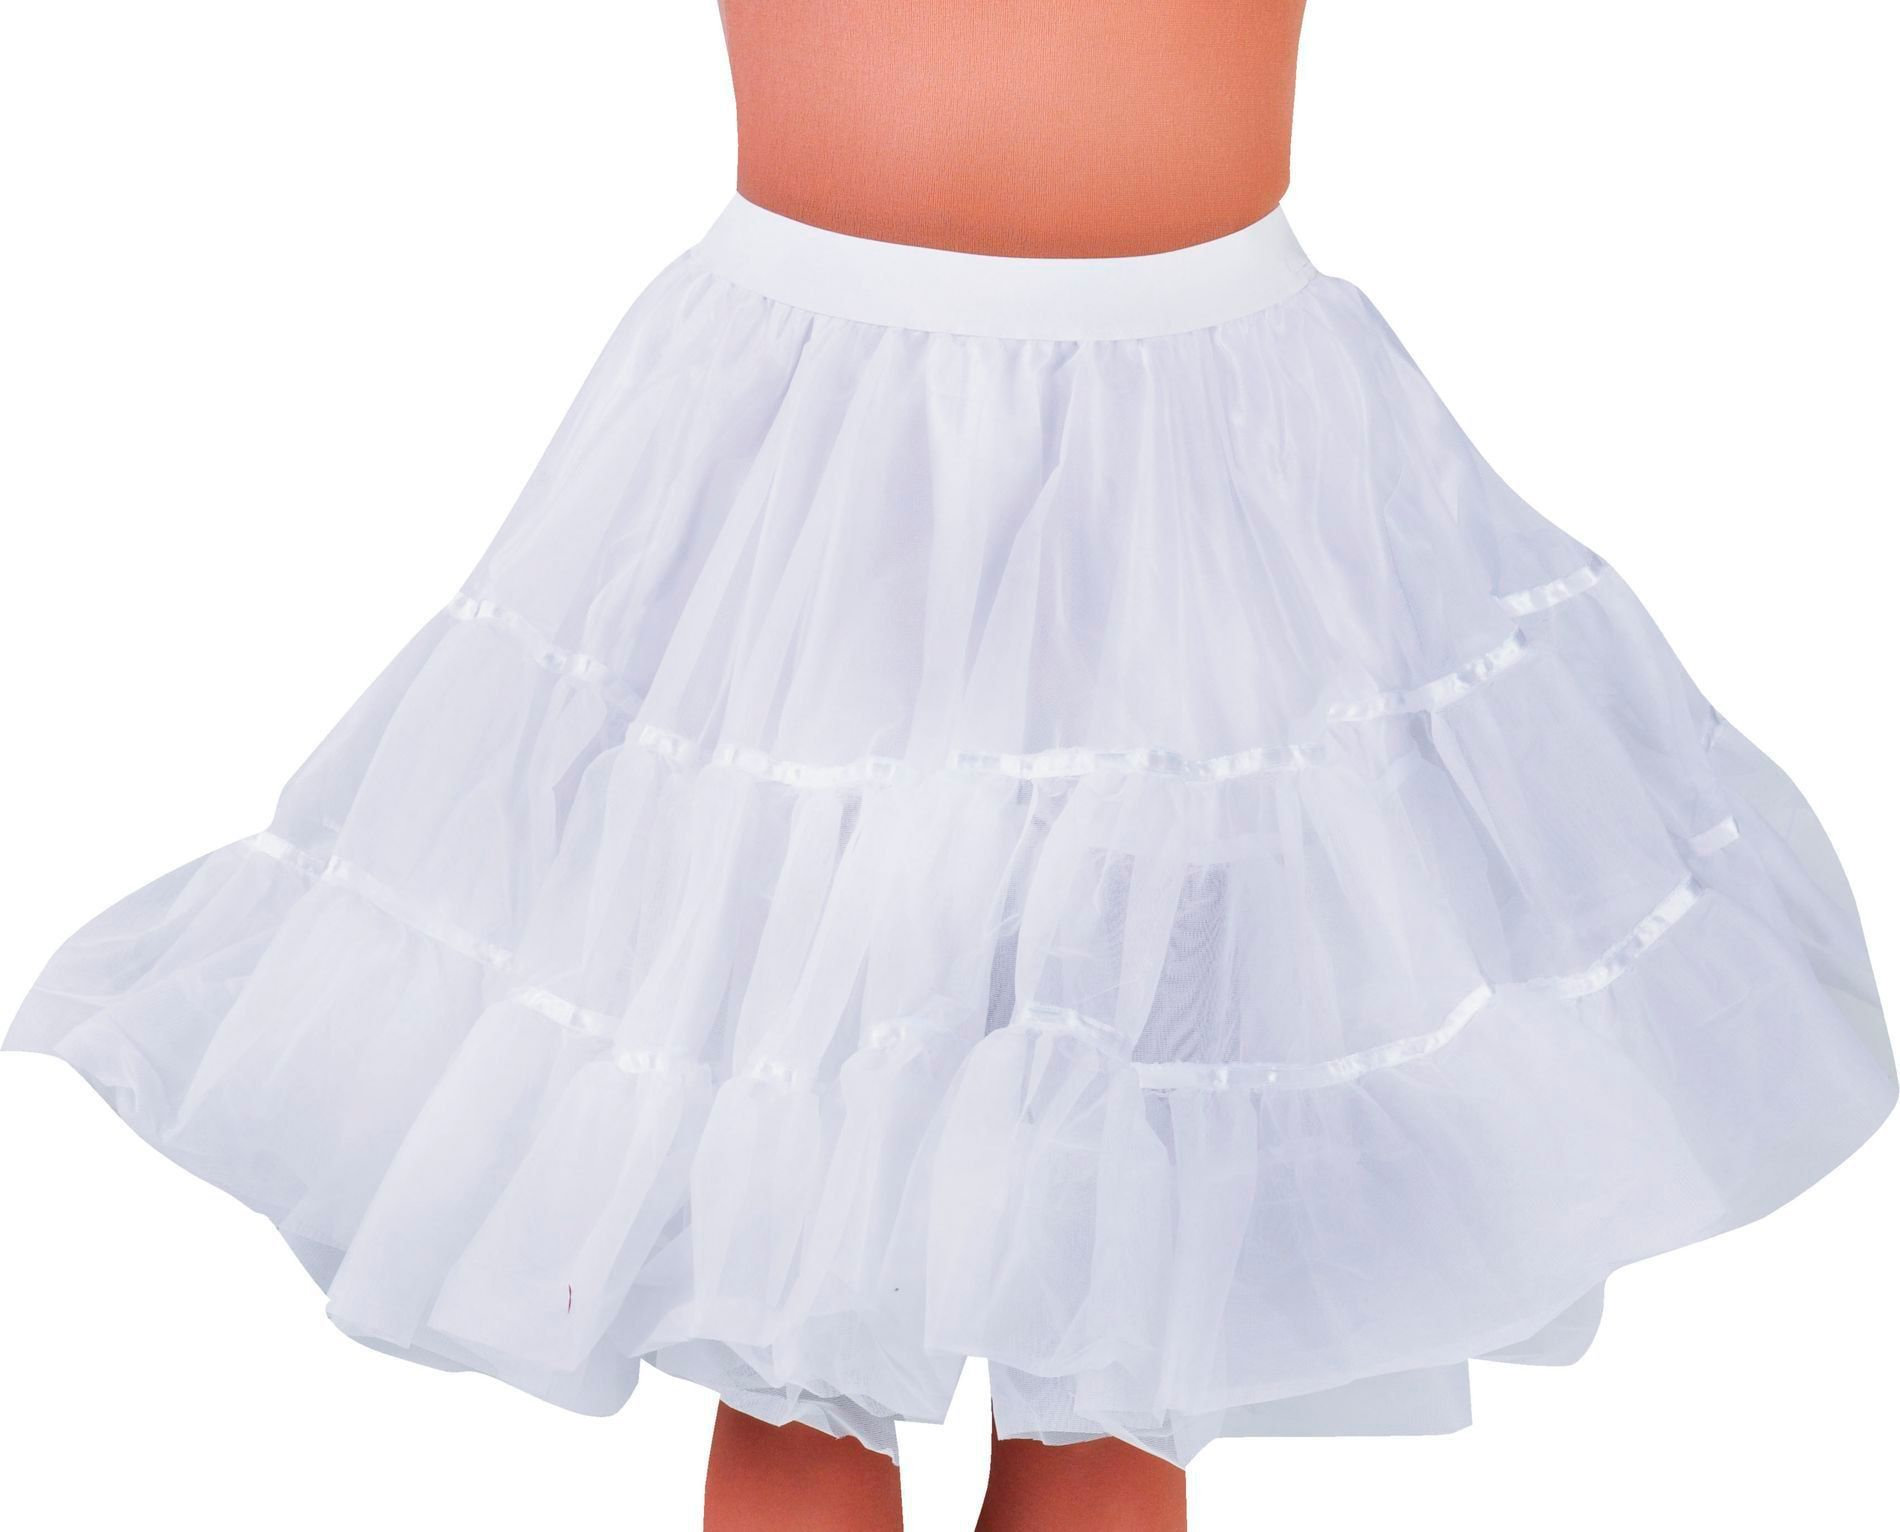 Petticoat wit dames middel lang